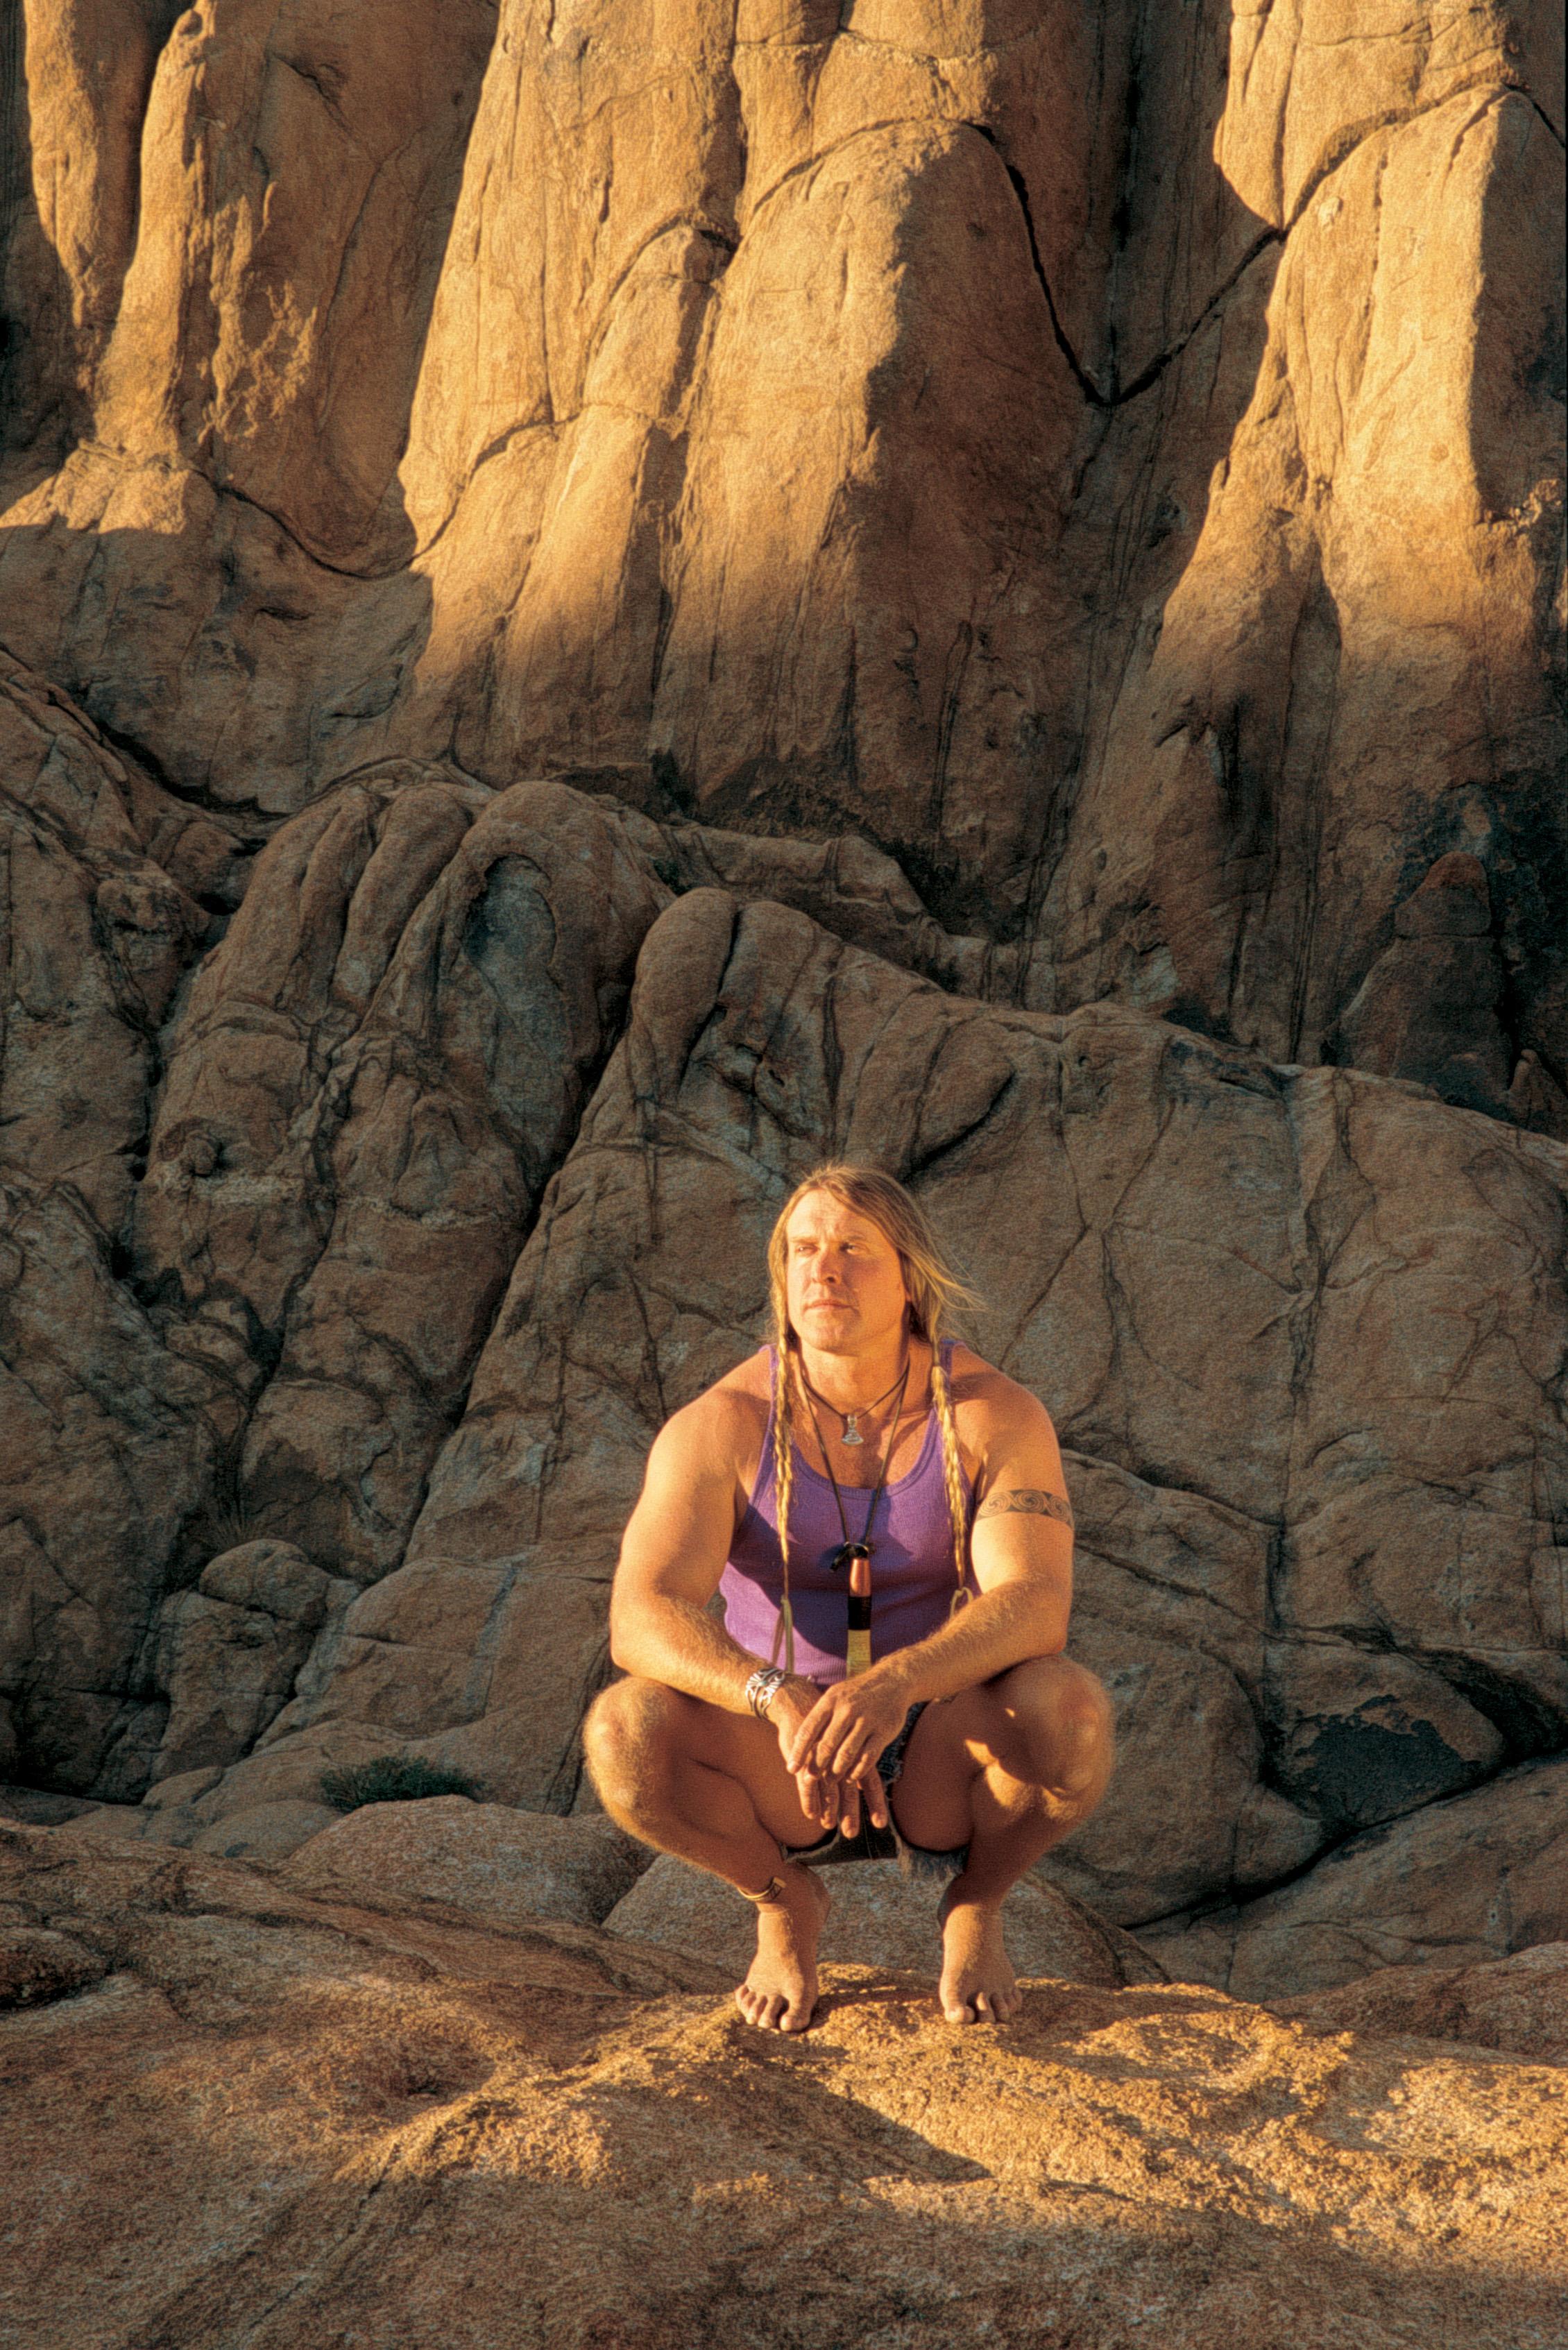 Cody Lundin Outdoor Survival Primitive Living Skills